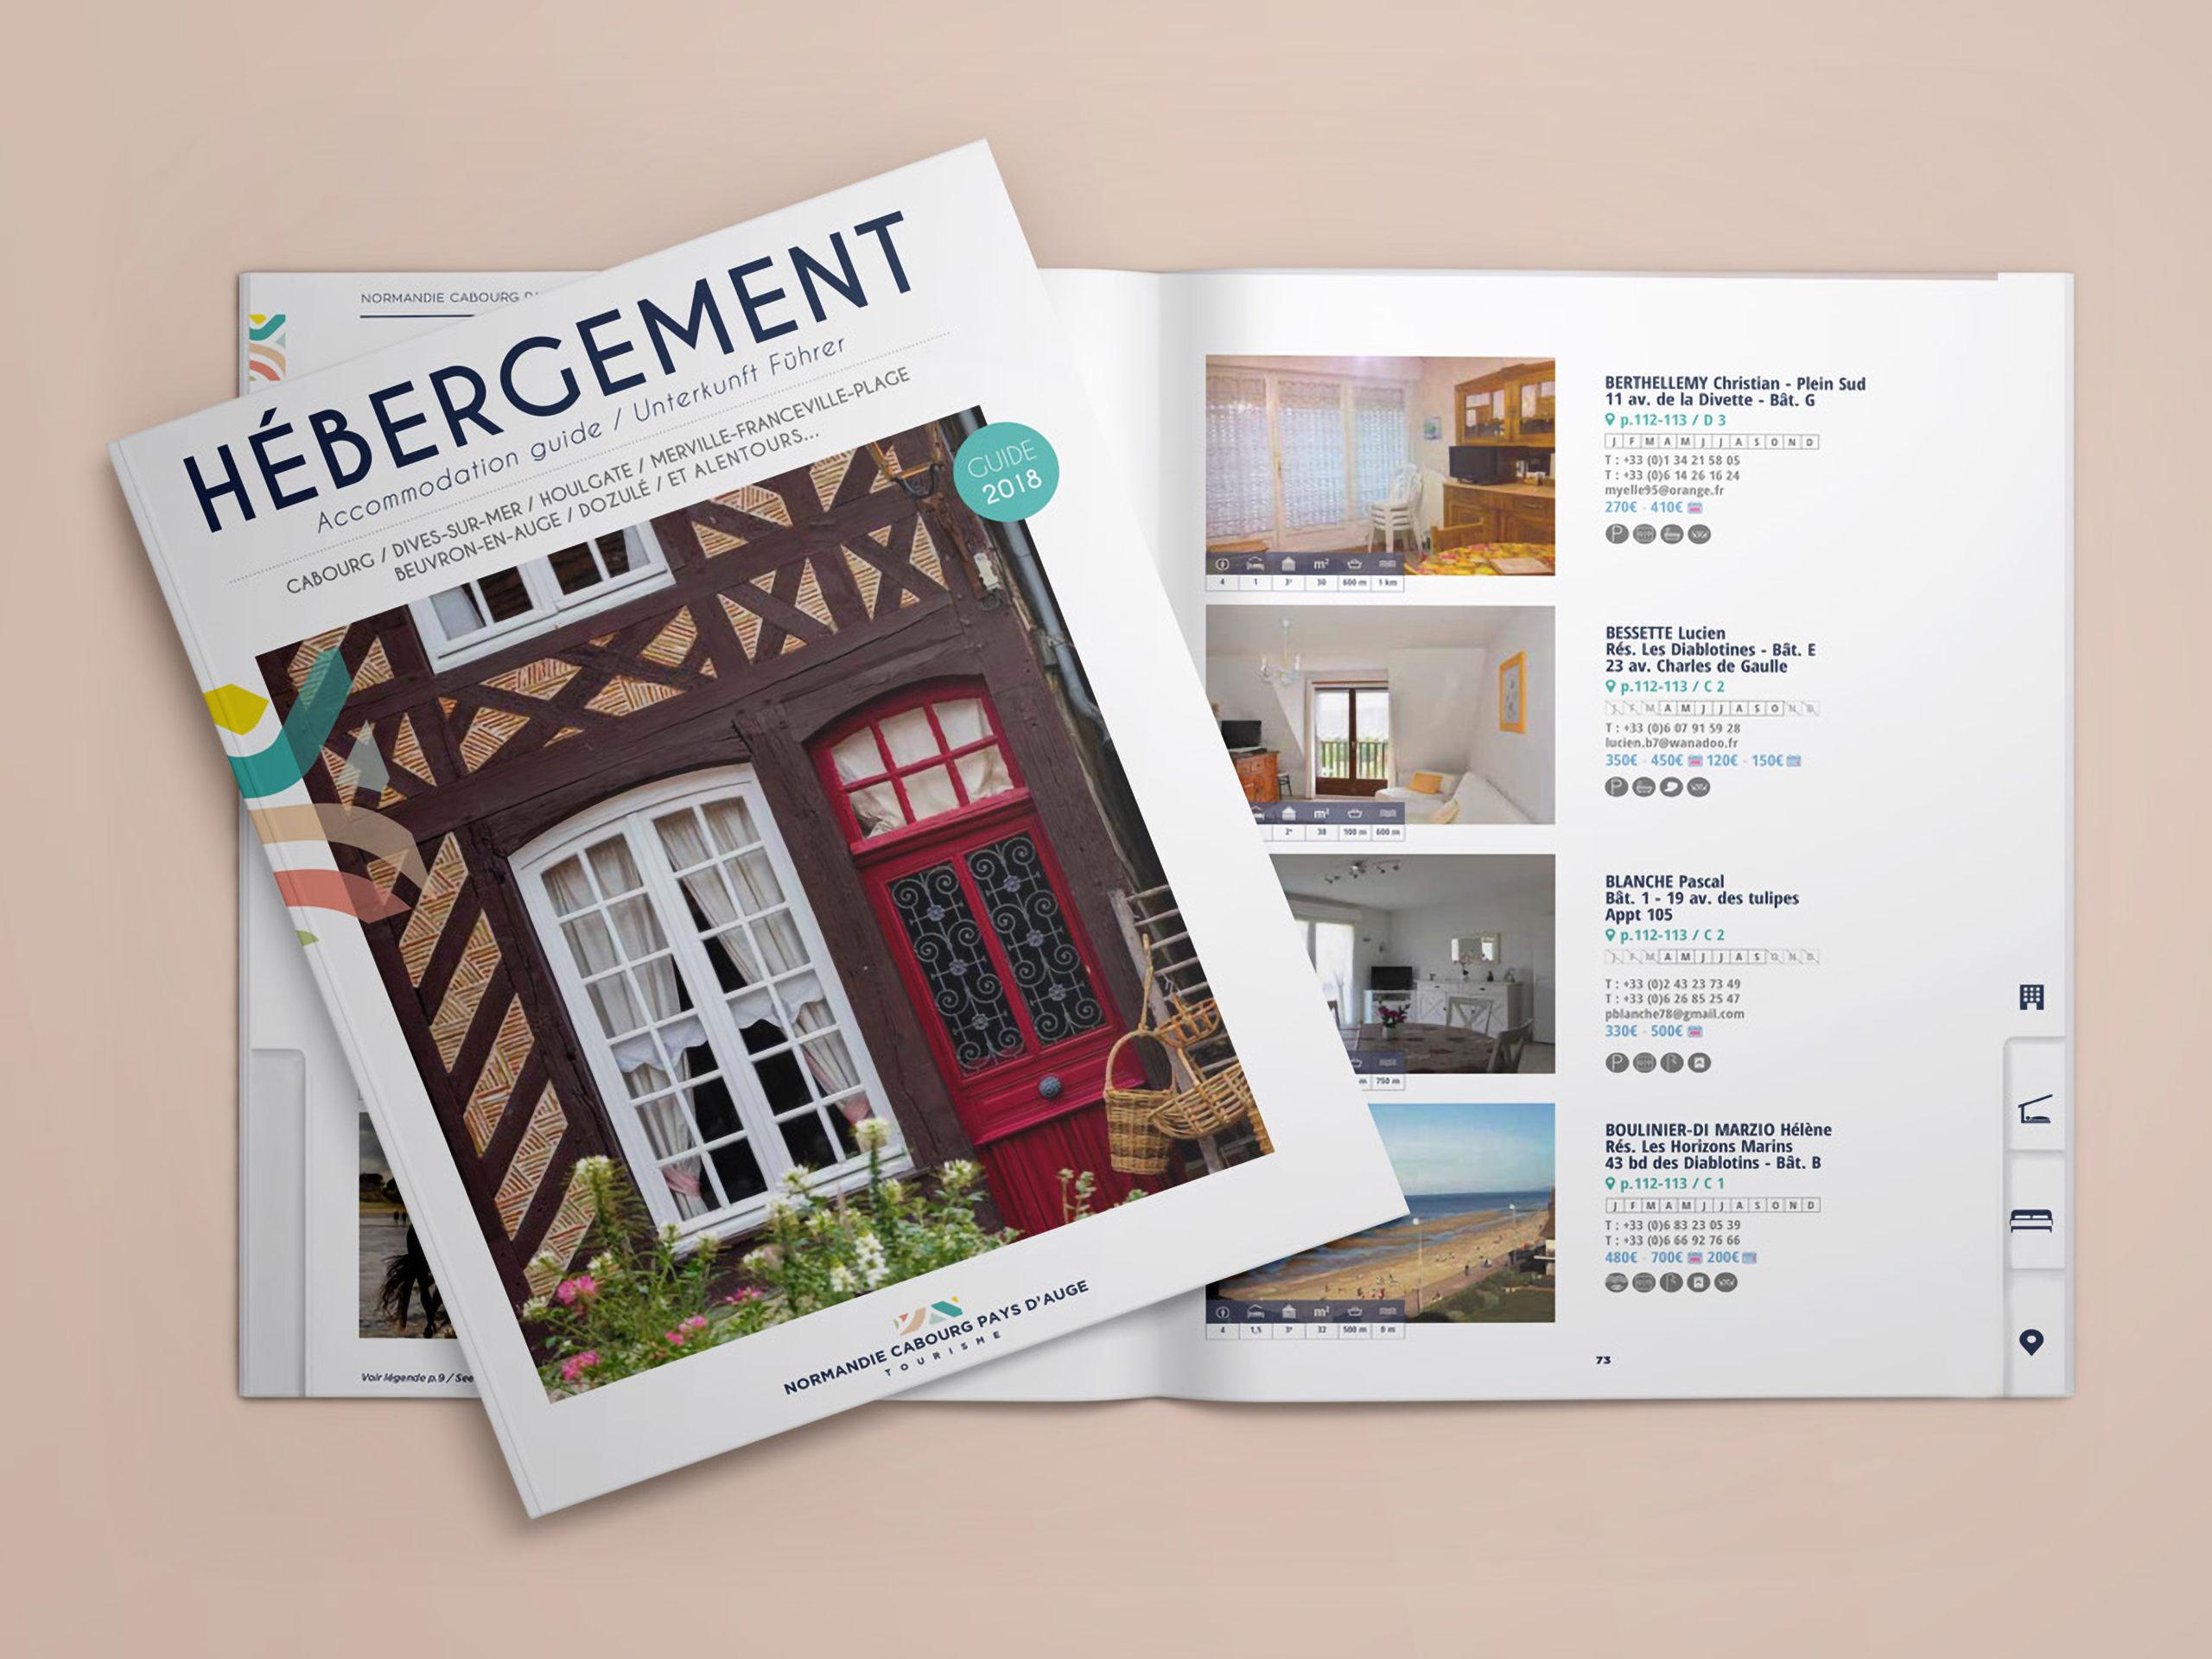 Guide hébergement Cabourg